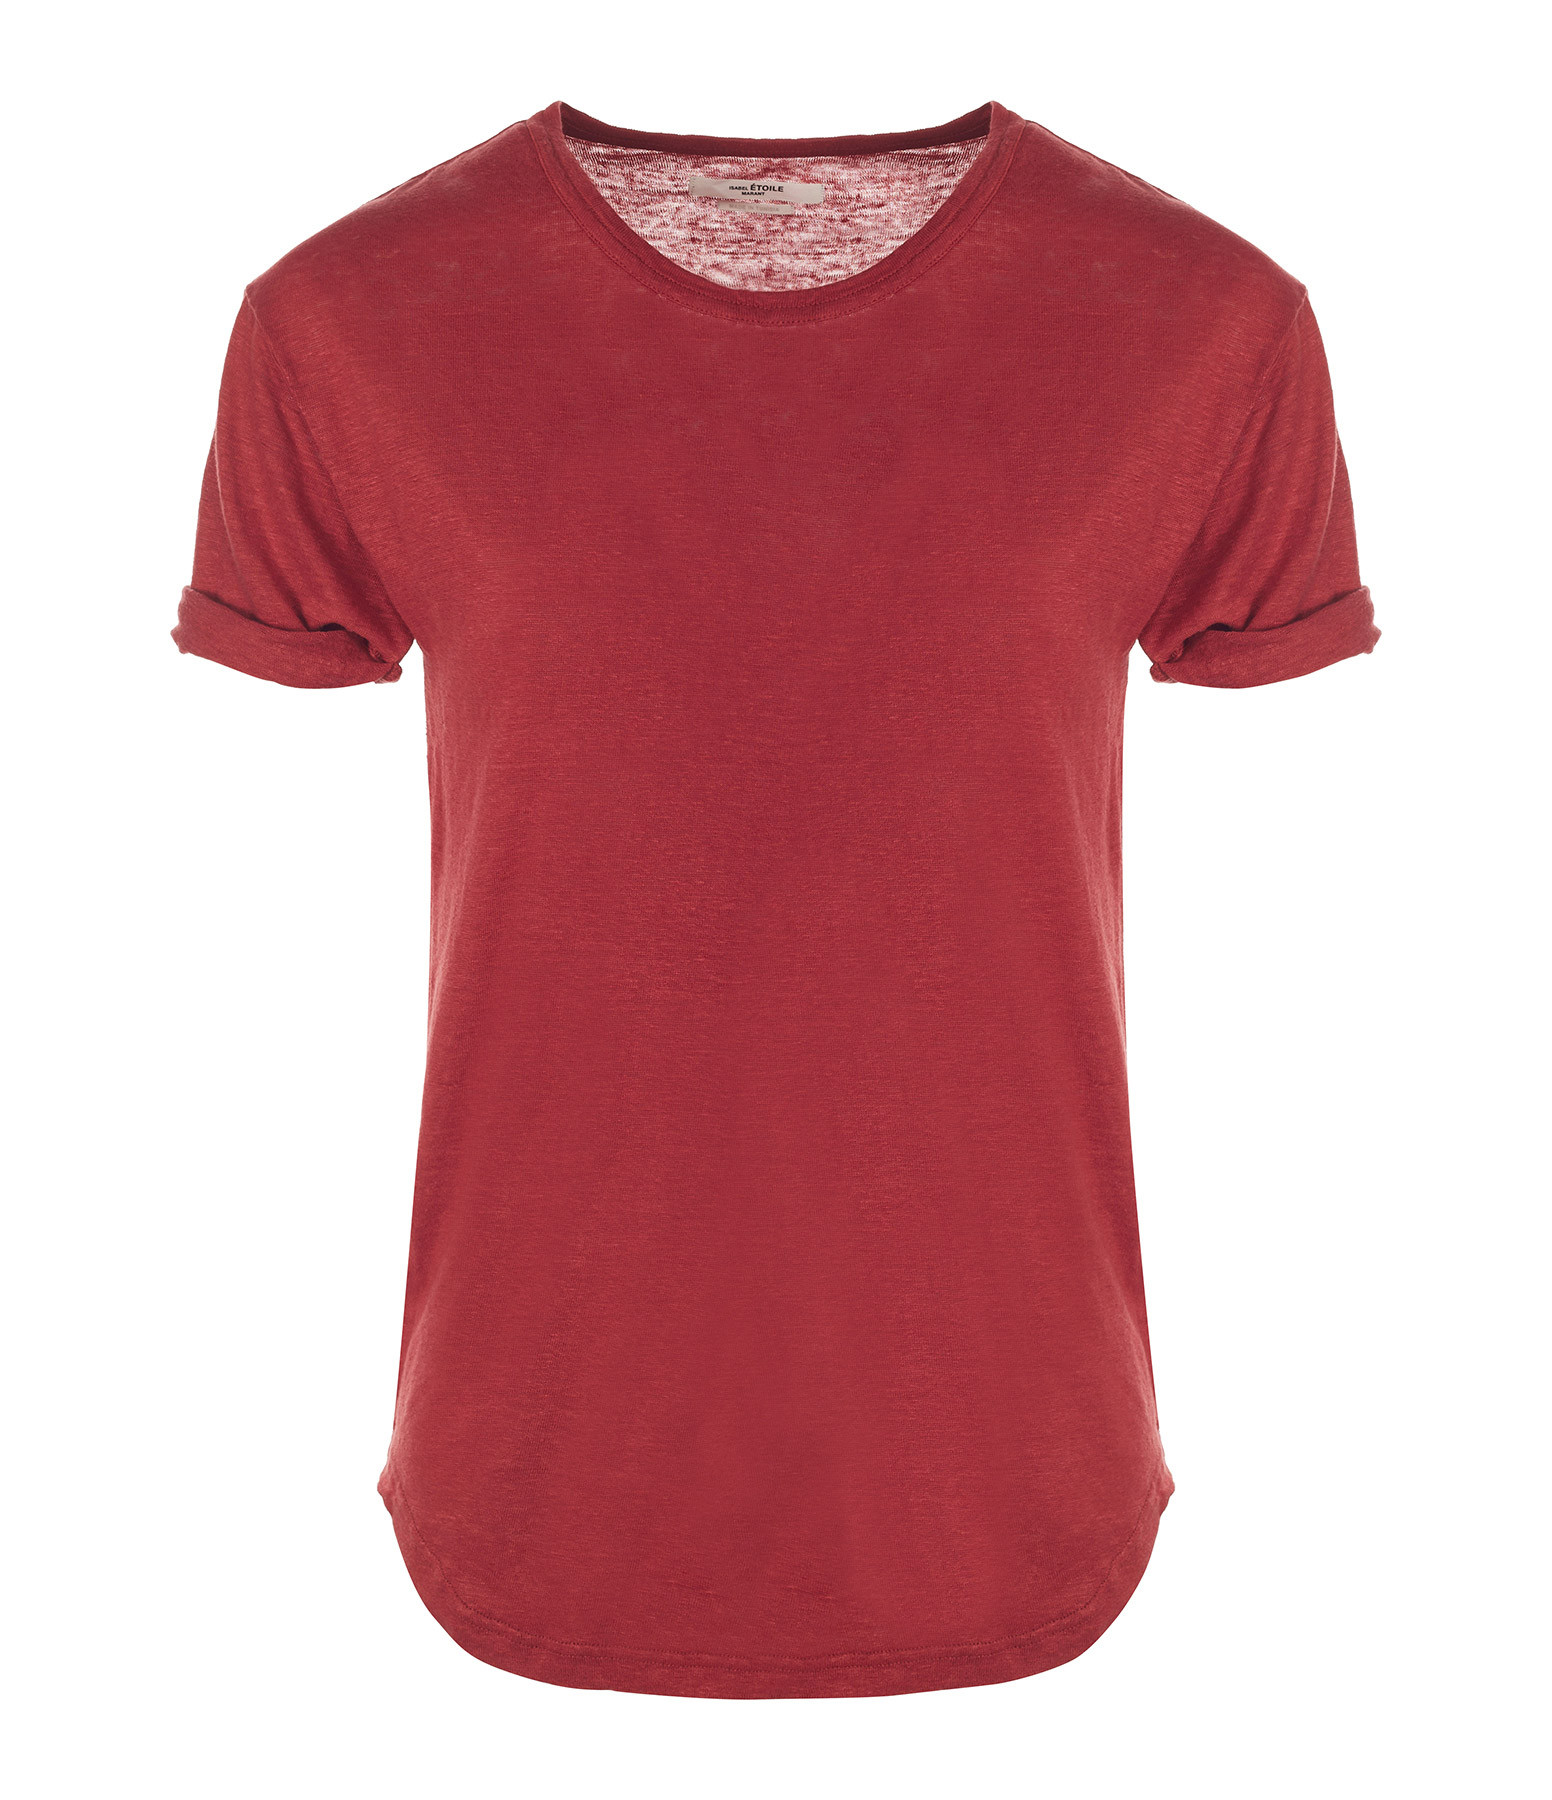 ISABEL MARANT ÉTOILE - Tee-shirt Koldi Lin Rouge